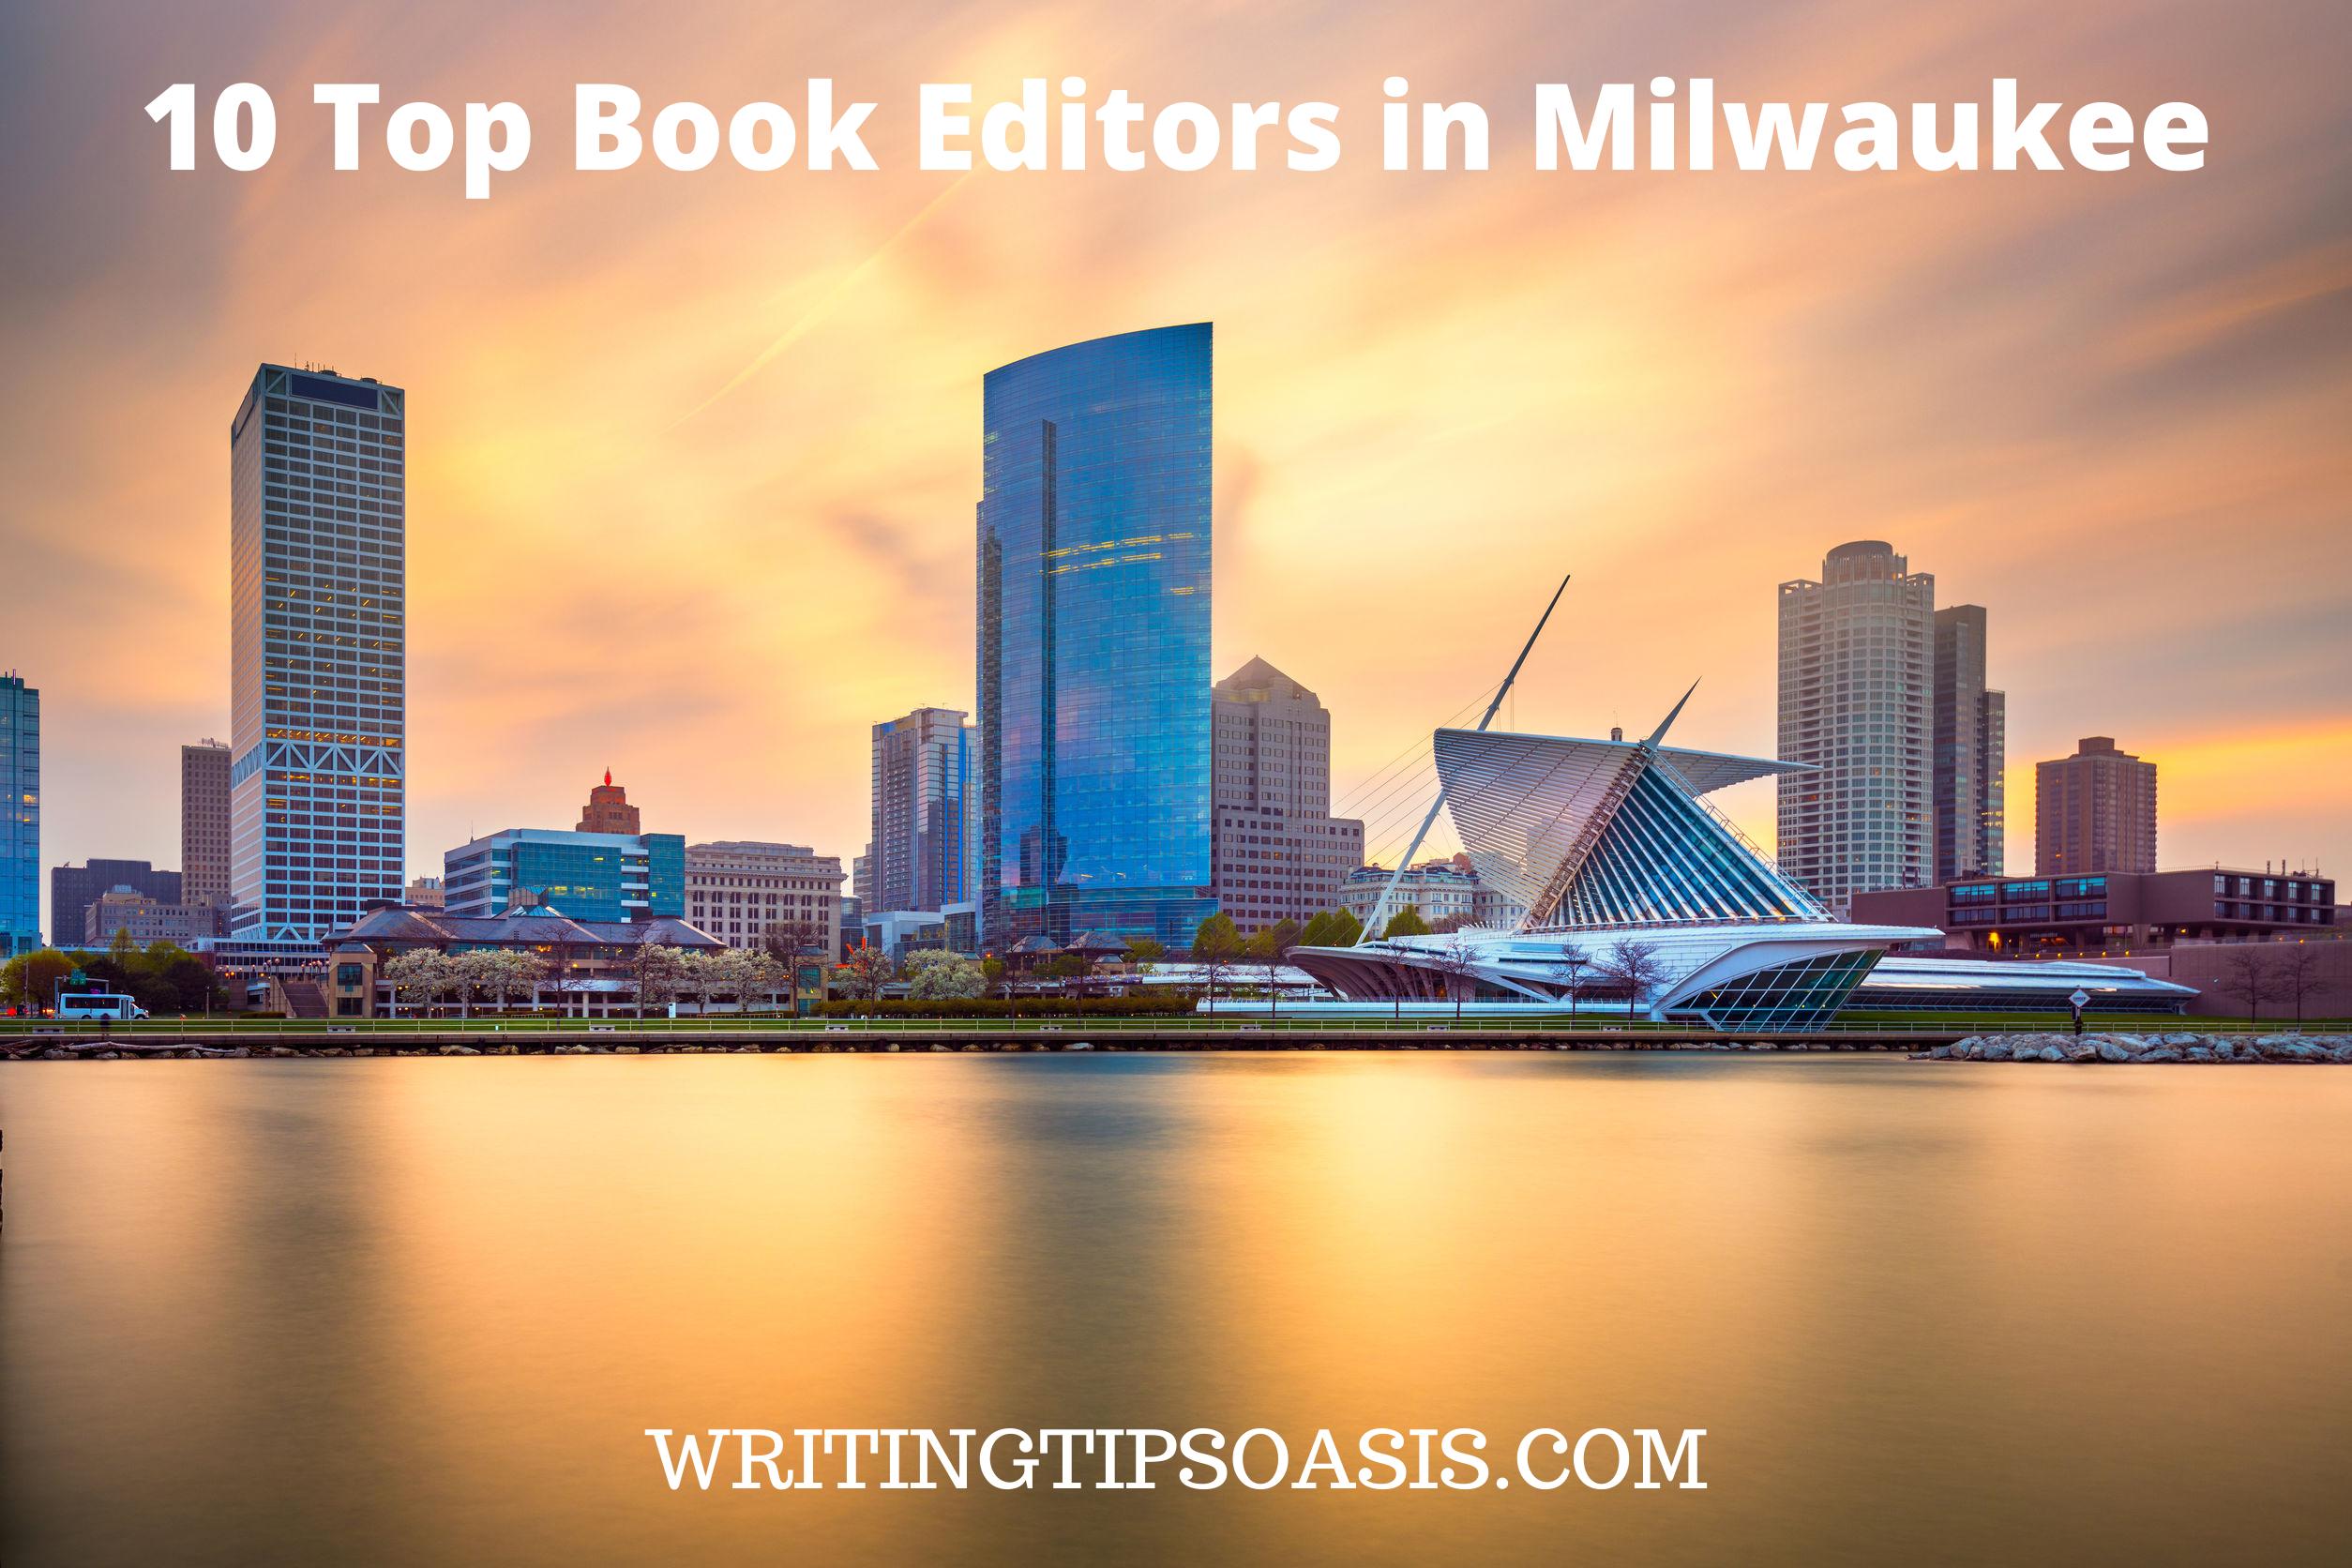 Book Editors in Milwaukee